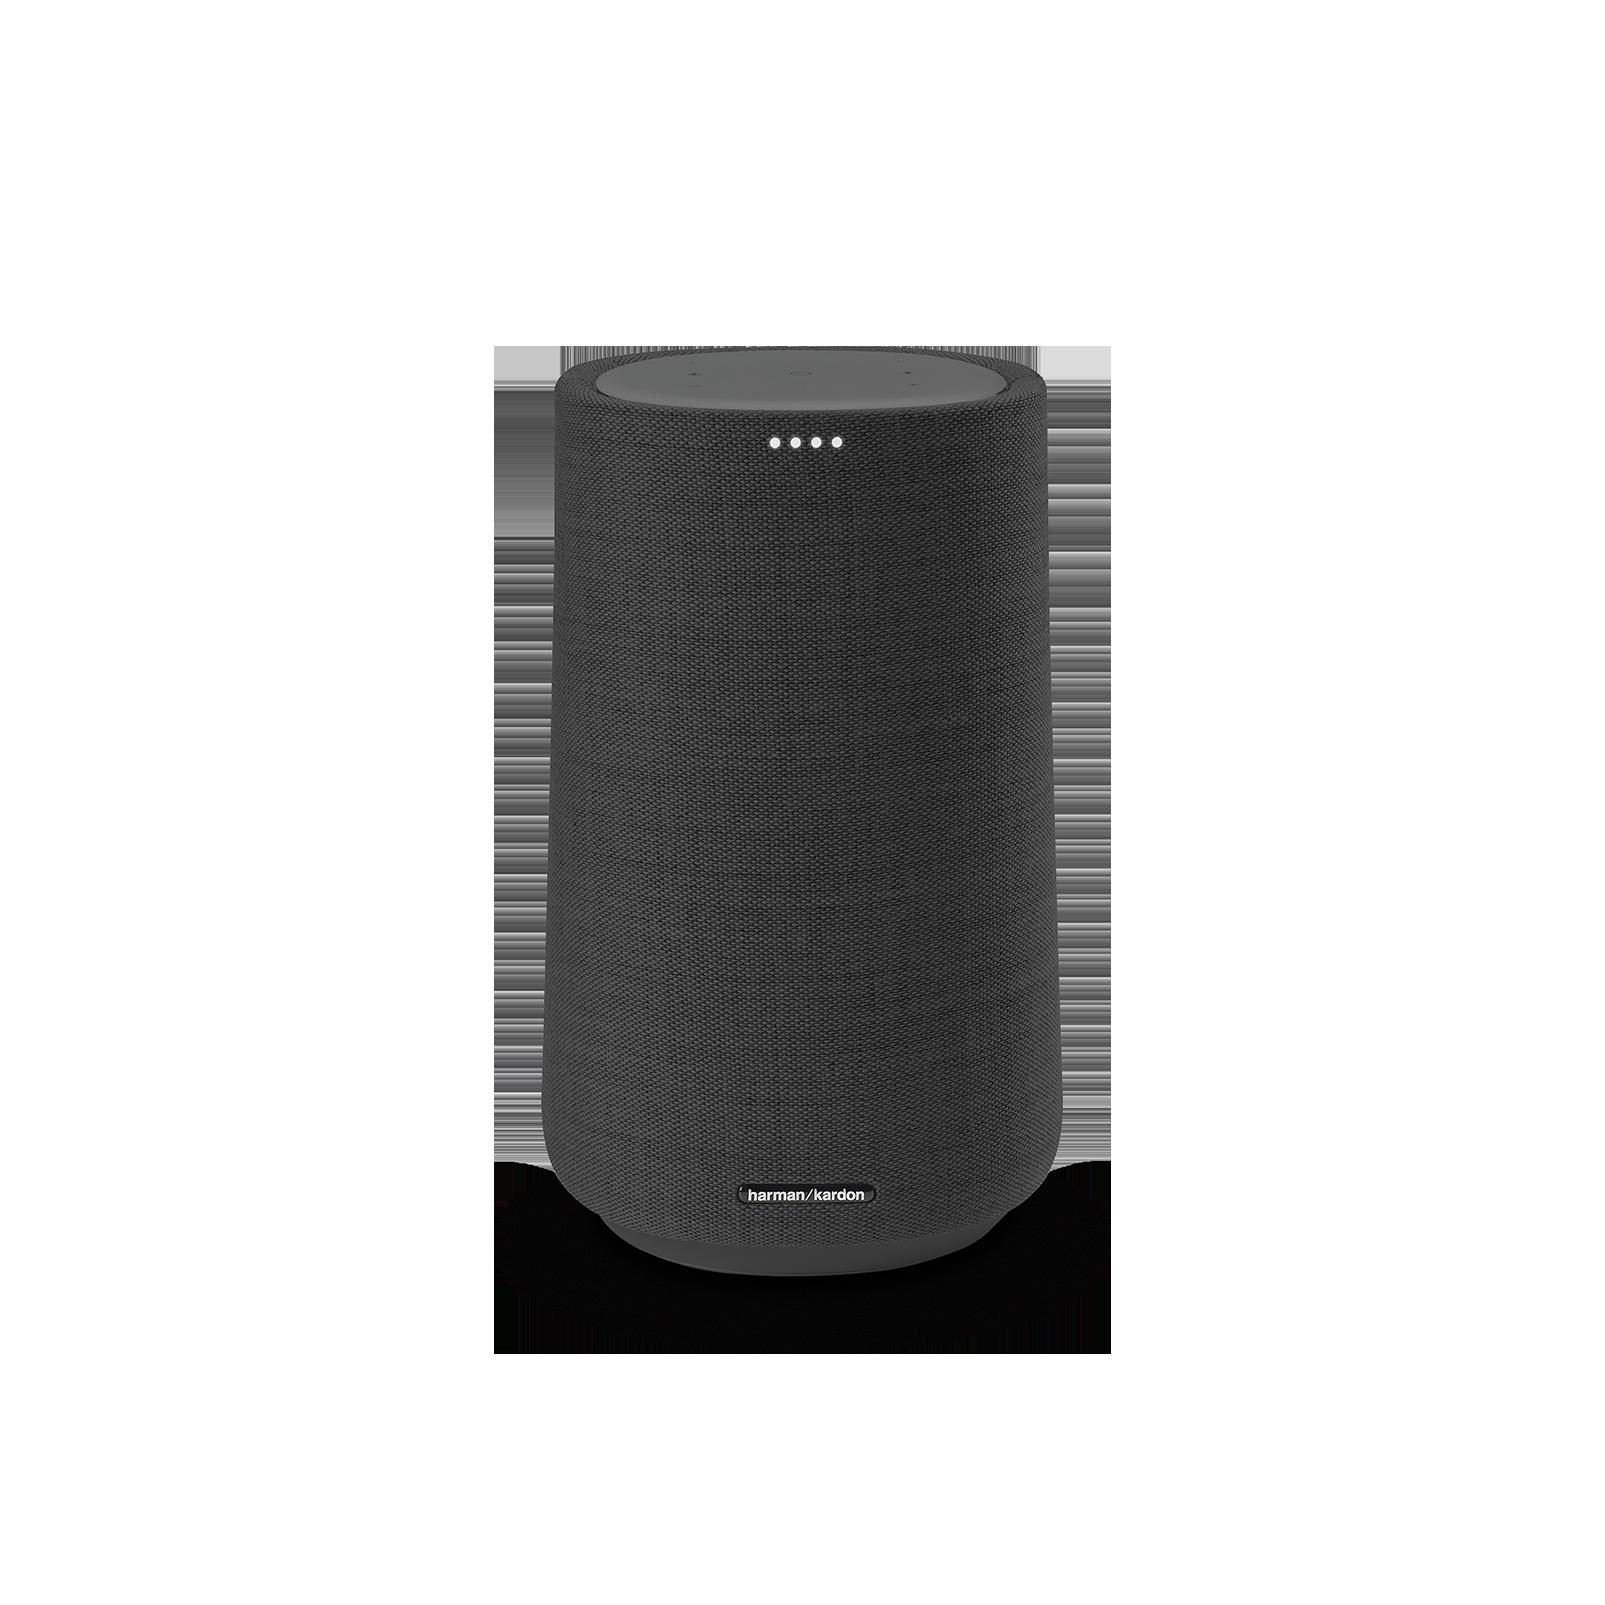 Harman Kardon Citation 100 - Black - The smallest, smartest home speaker with impactful sound - Front